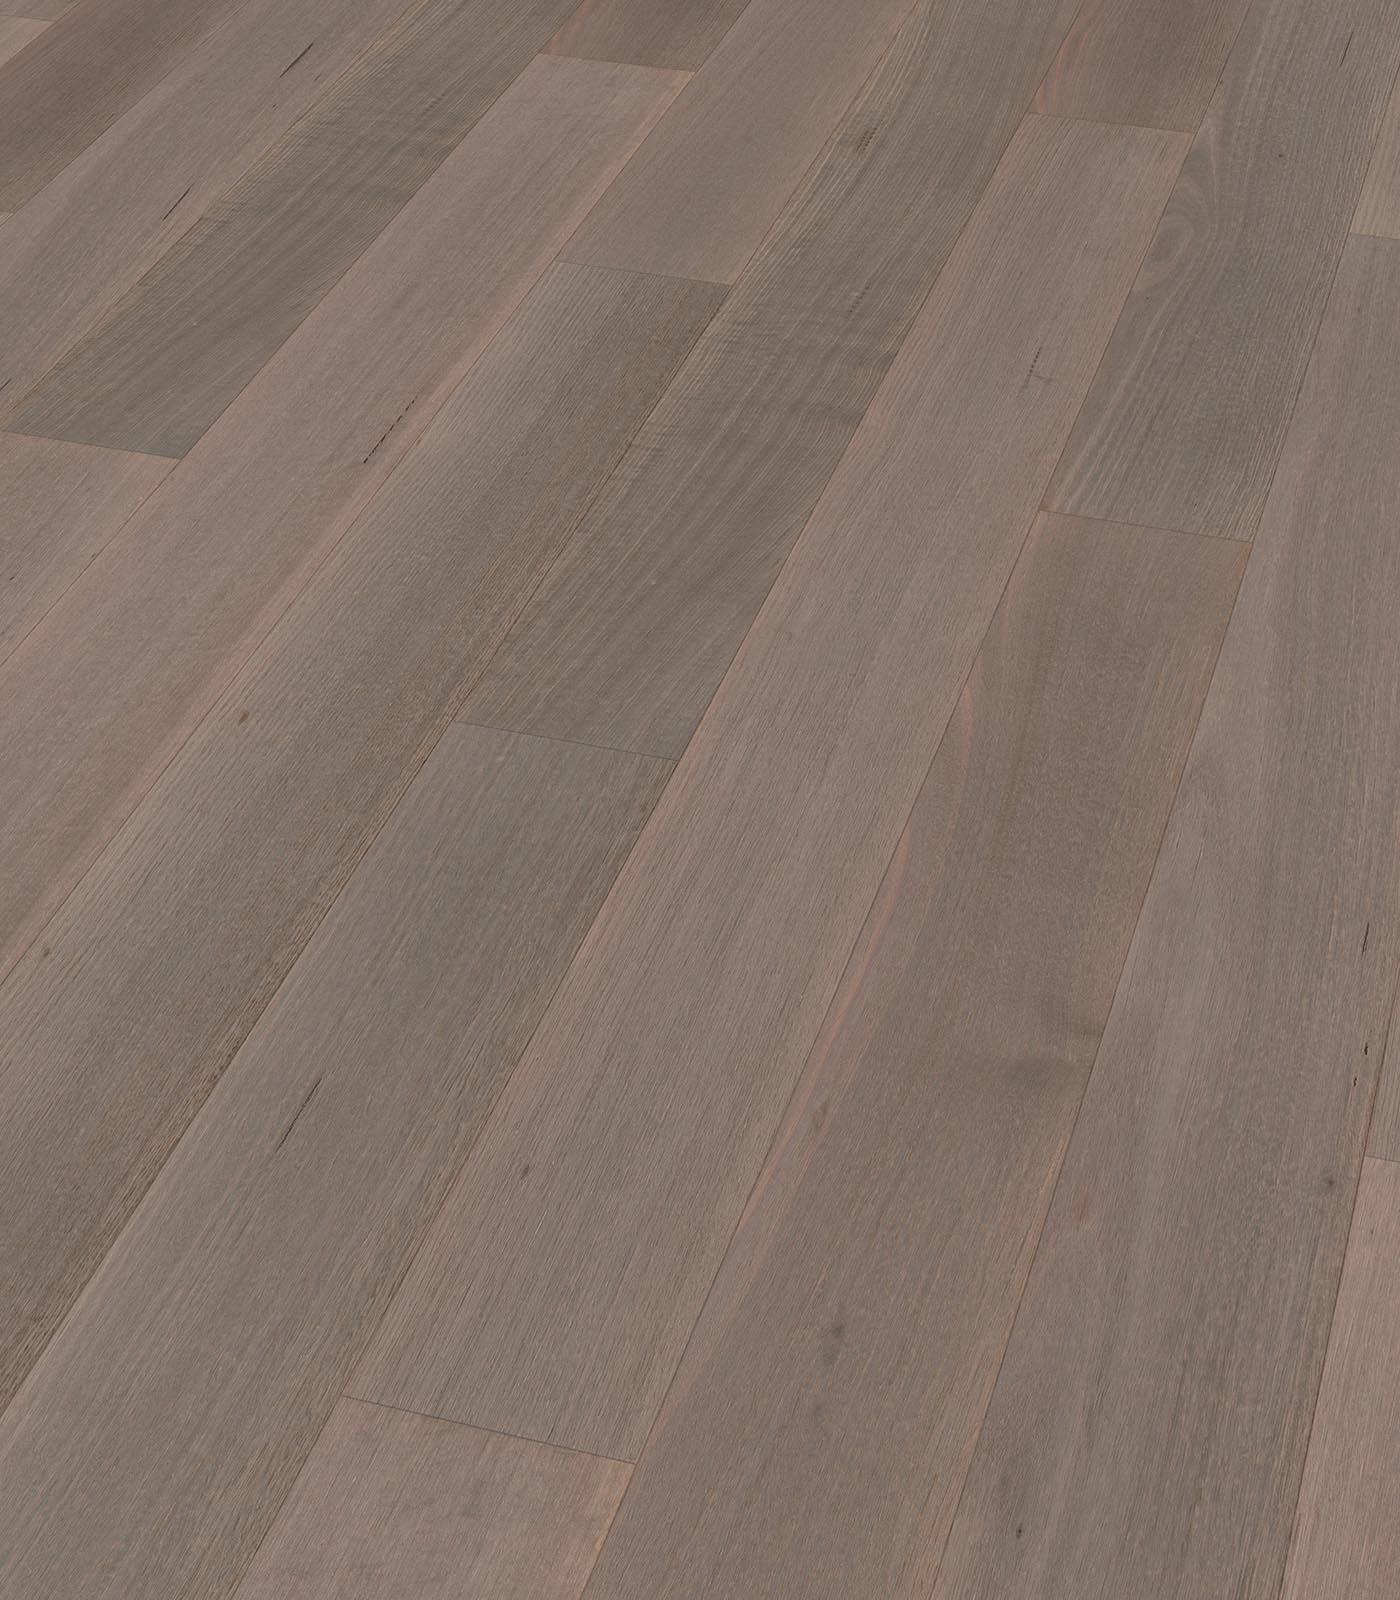 Coffs Harbour-Tasmanian Oak floors-After Oak Collection-angle